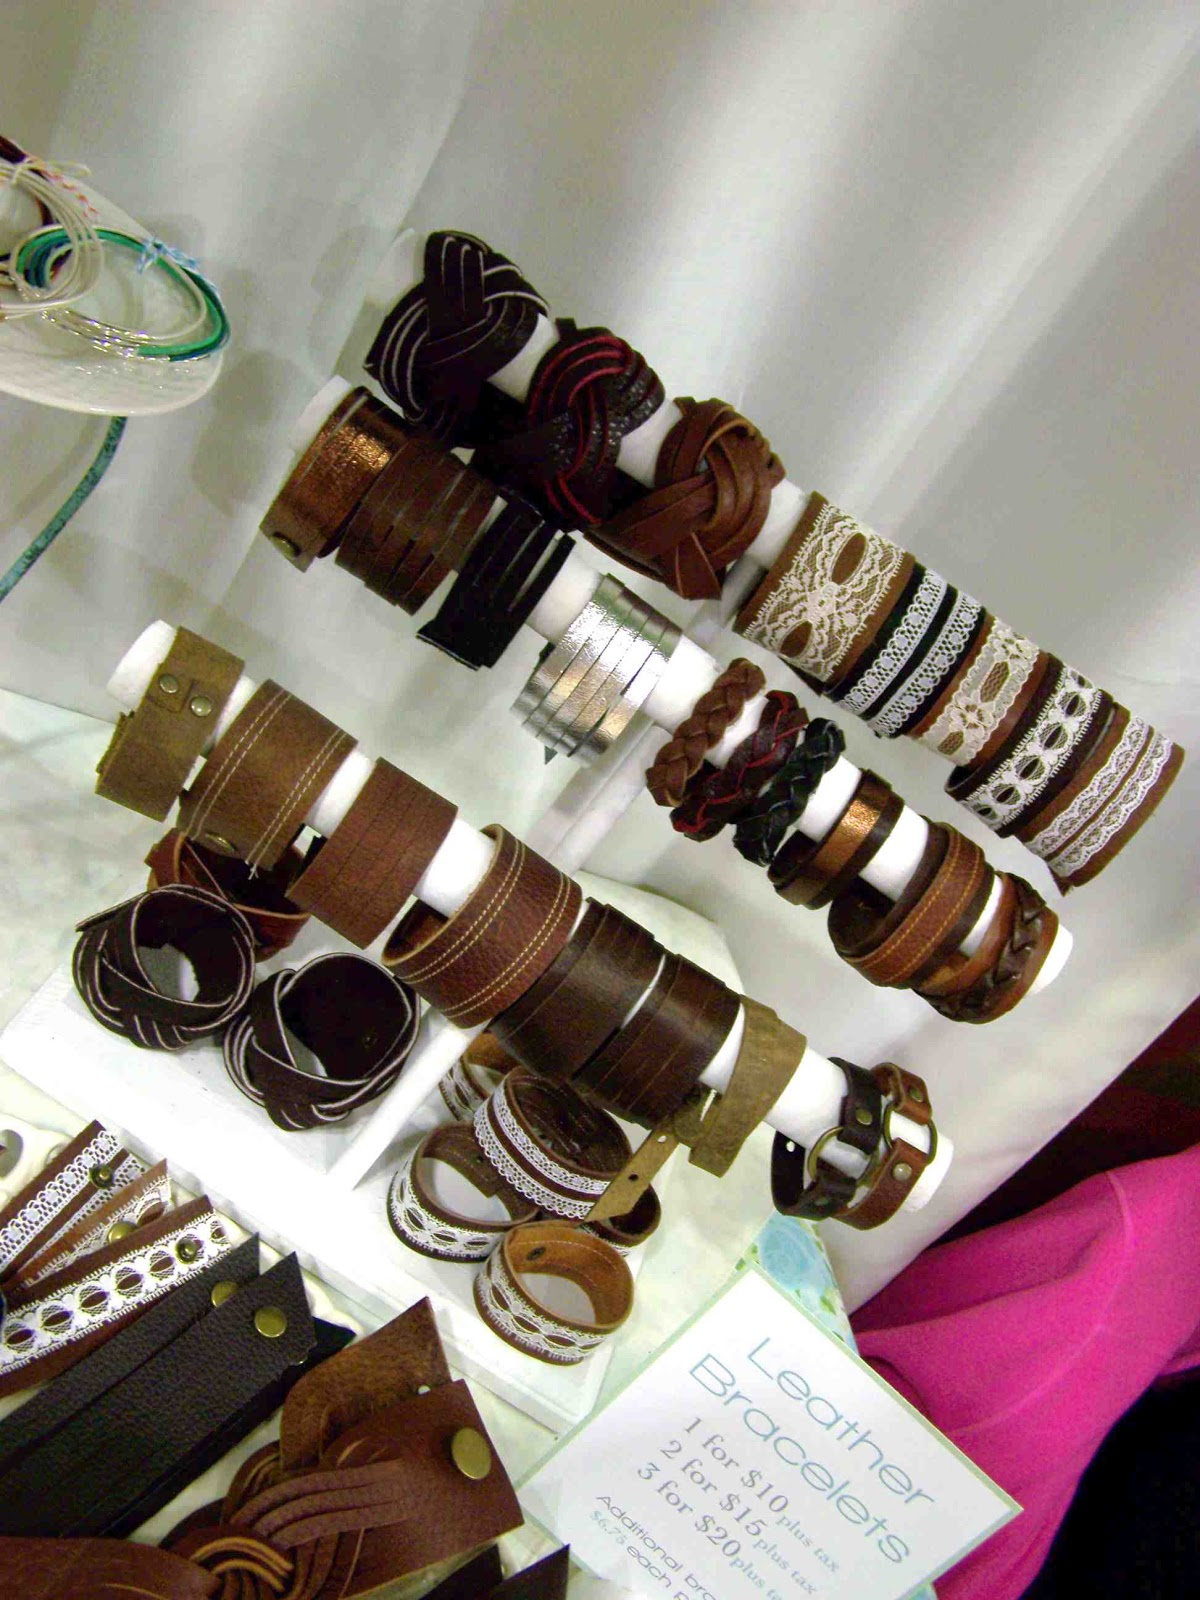 http://2.bp.blogspot.com/-0SCQ5nwjzJQ/UL7Xw9REuuI/AAAAAAAAHQw/zHCeD4HGCa4/s1600/craft+fair+leather+bracelets.jpg